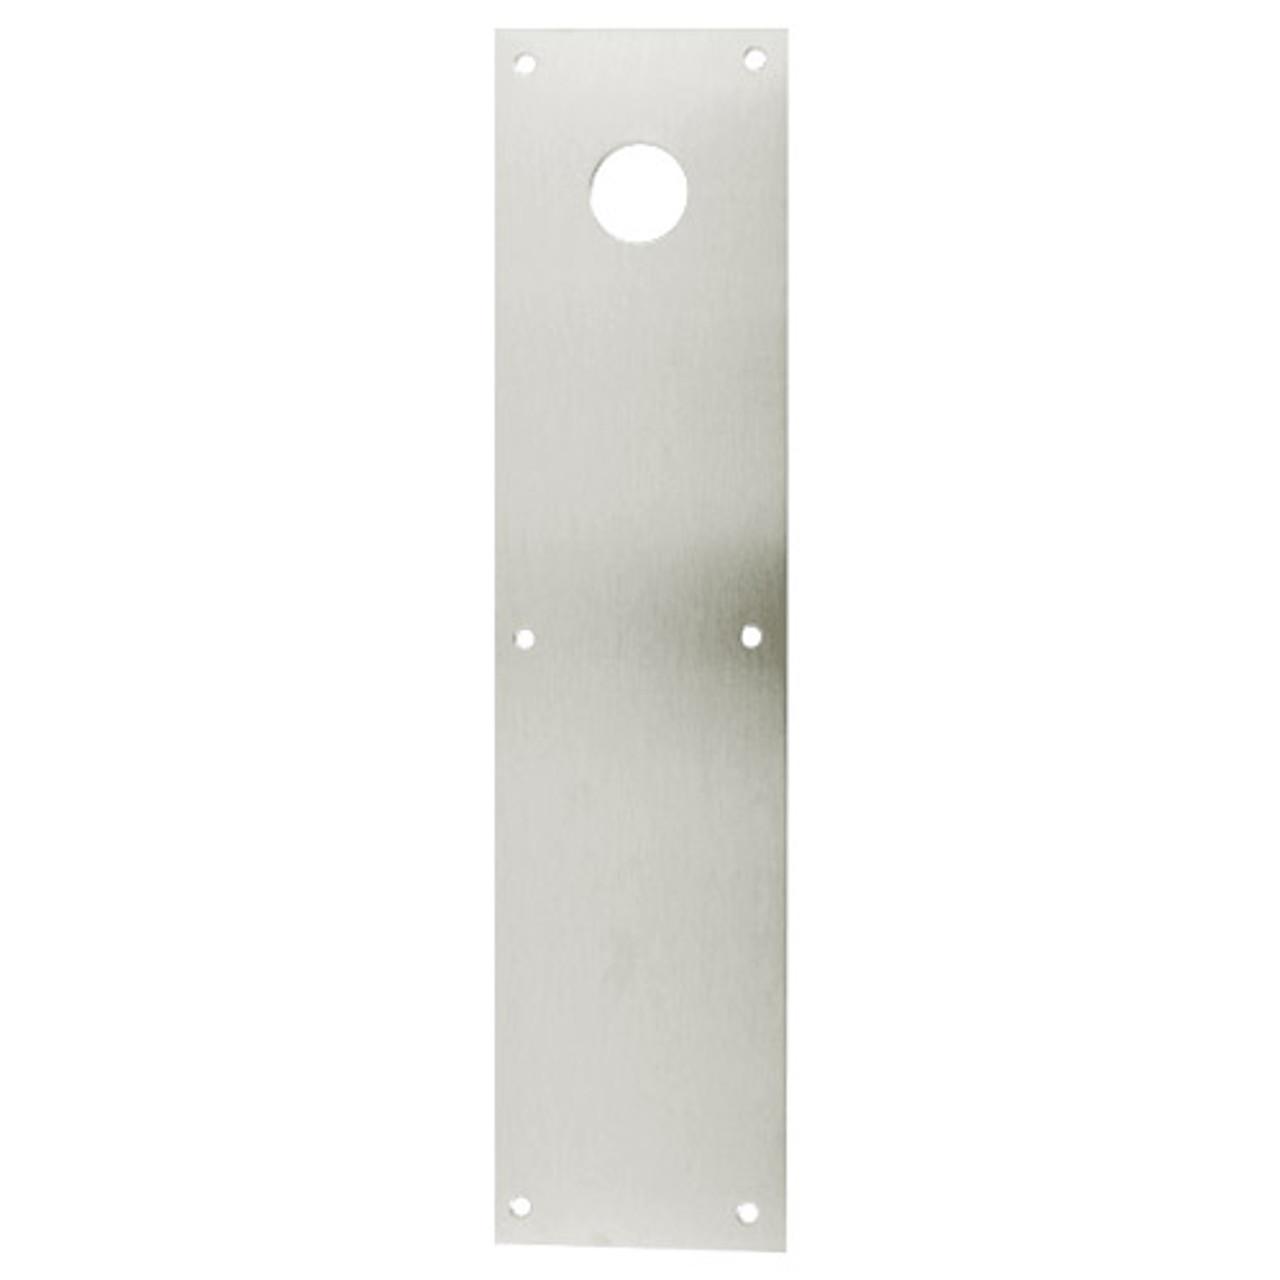 CFK70-628 Don Jo Push Plates with Holes in Aluminum Finish